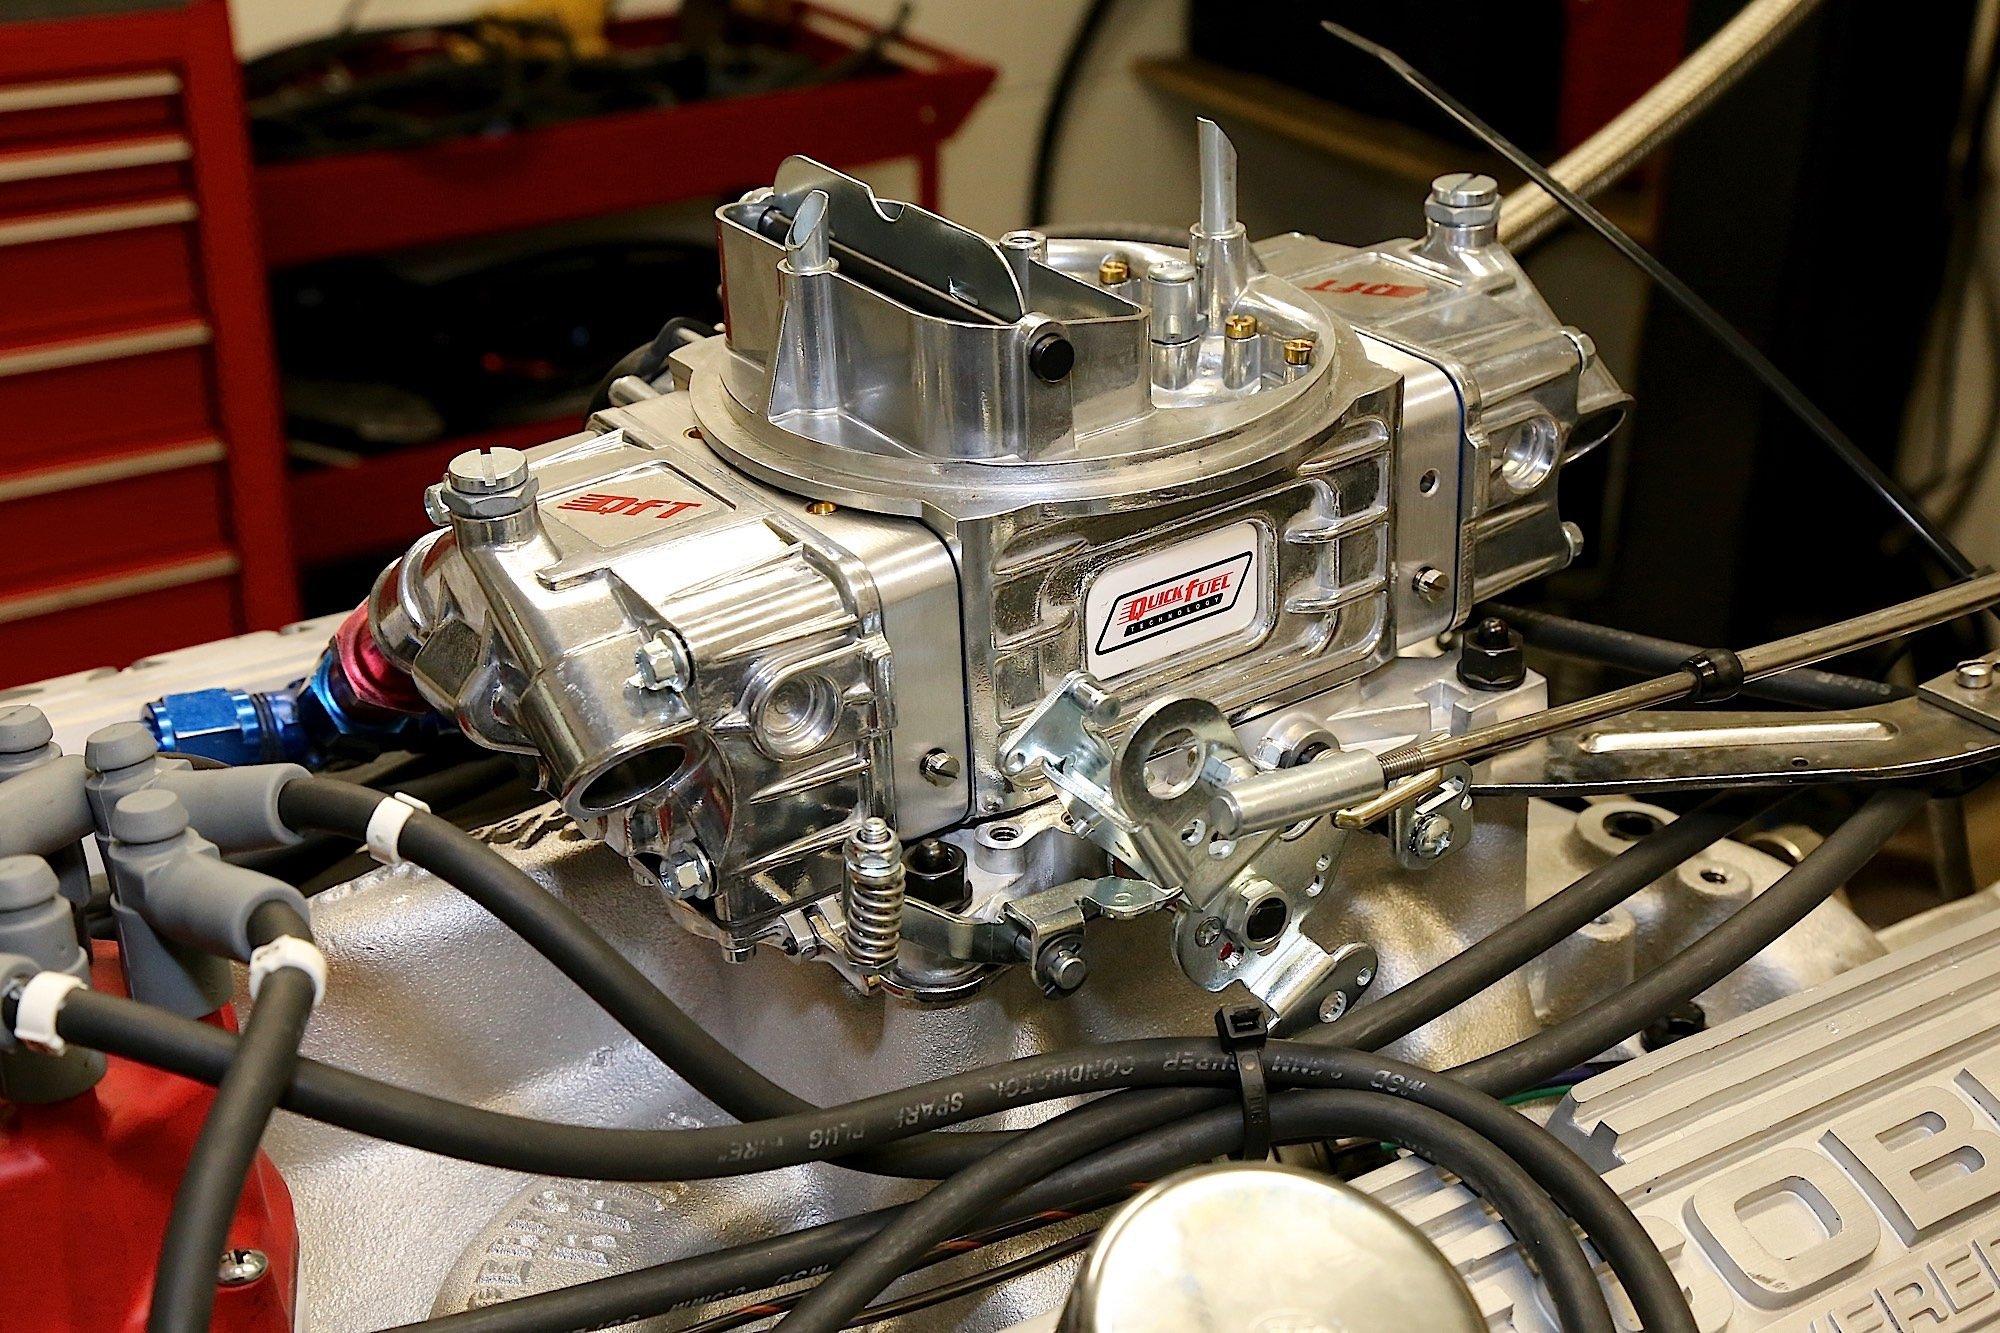 Dyno Test: ReKreating the Ford 289 K-code V8 – Part II